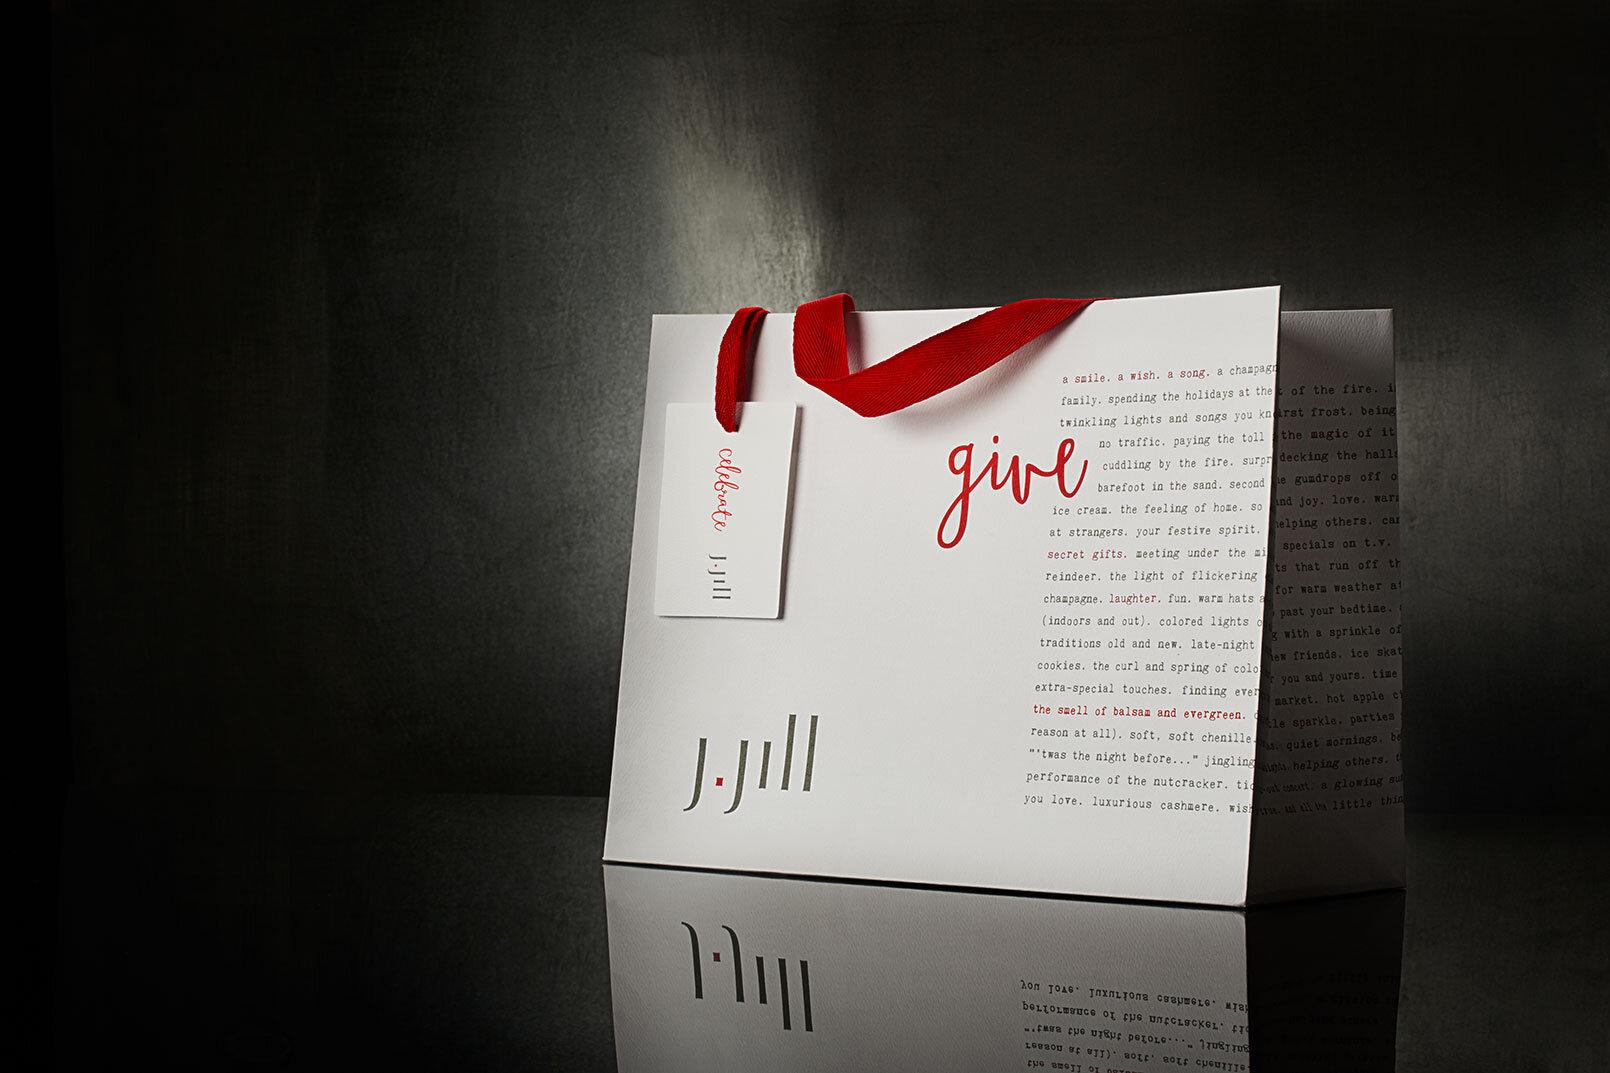 Jjill-Shopping-Bag-Design-Packaging-Holiday.jpg